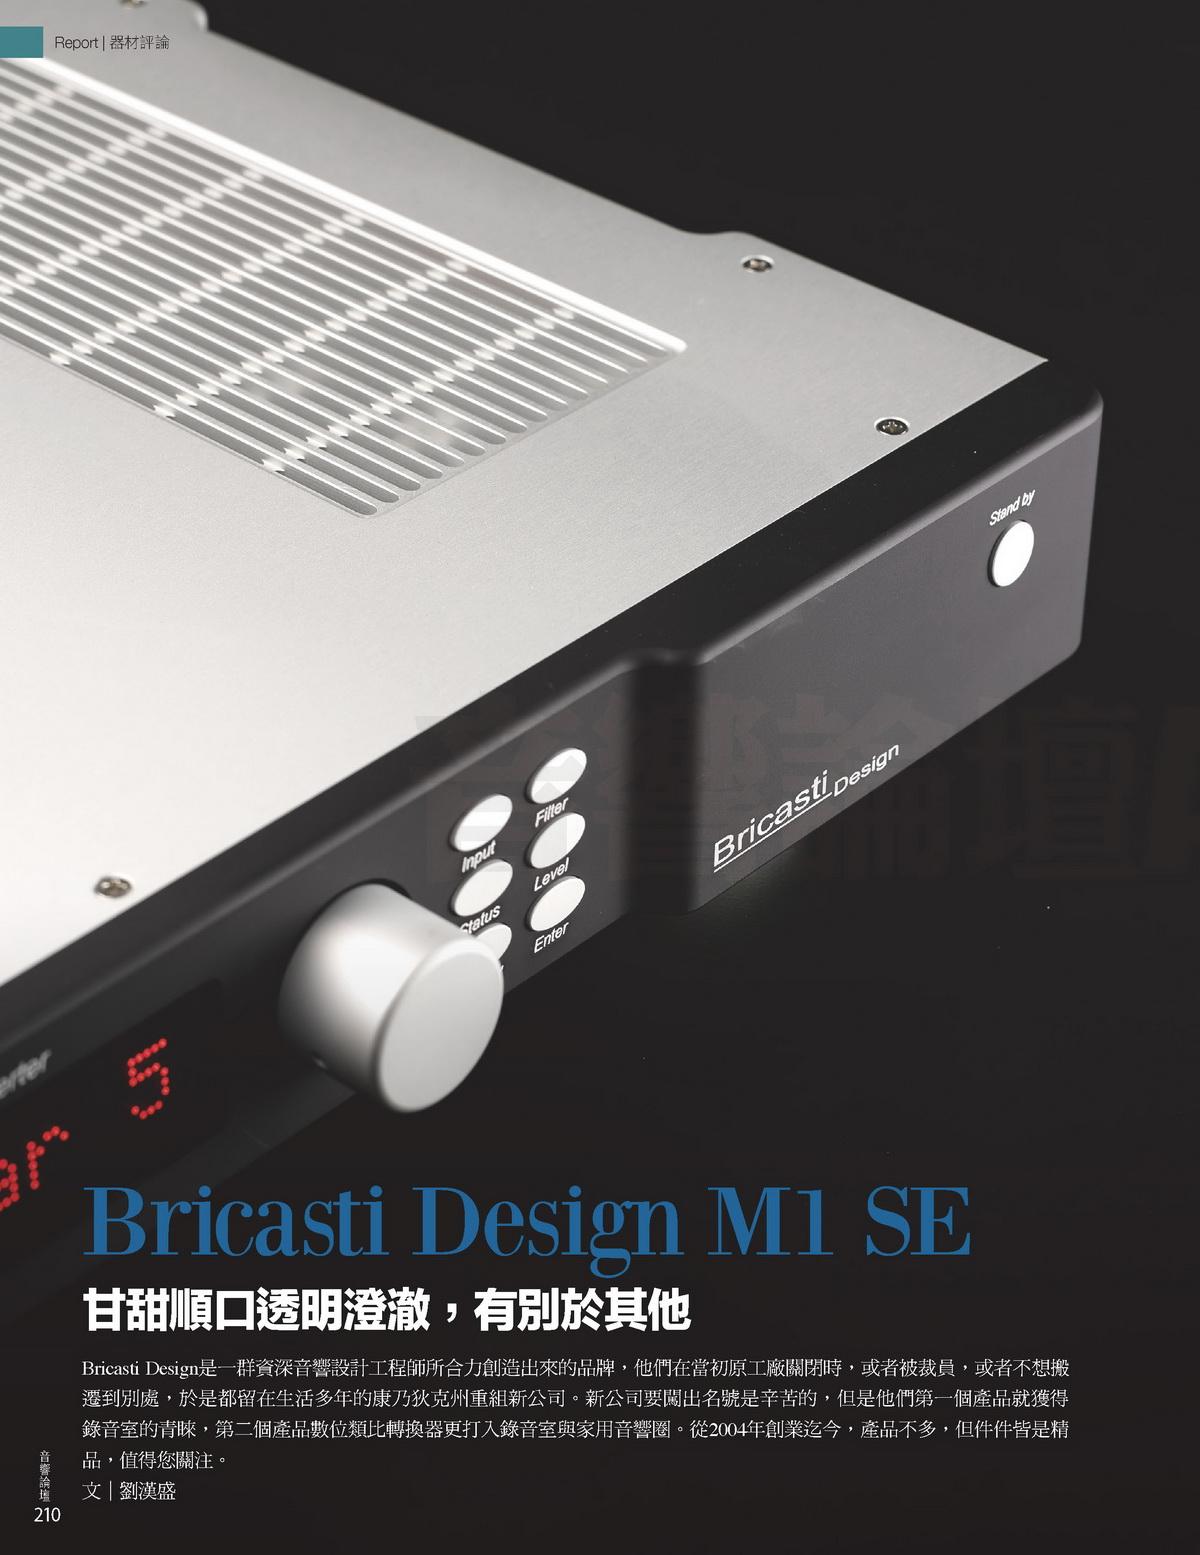 337 期Bricasti Design M1 SE_頁面_1